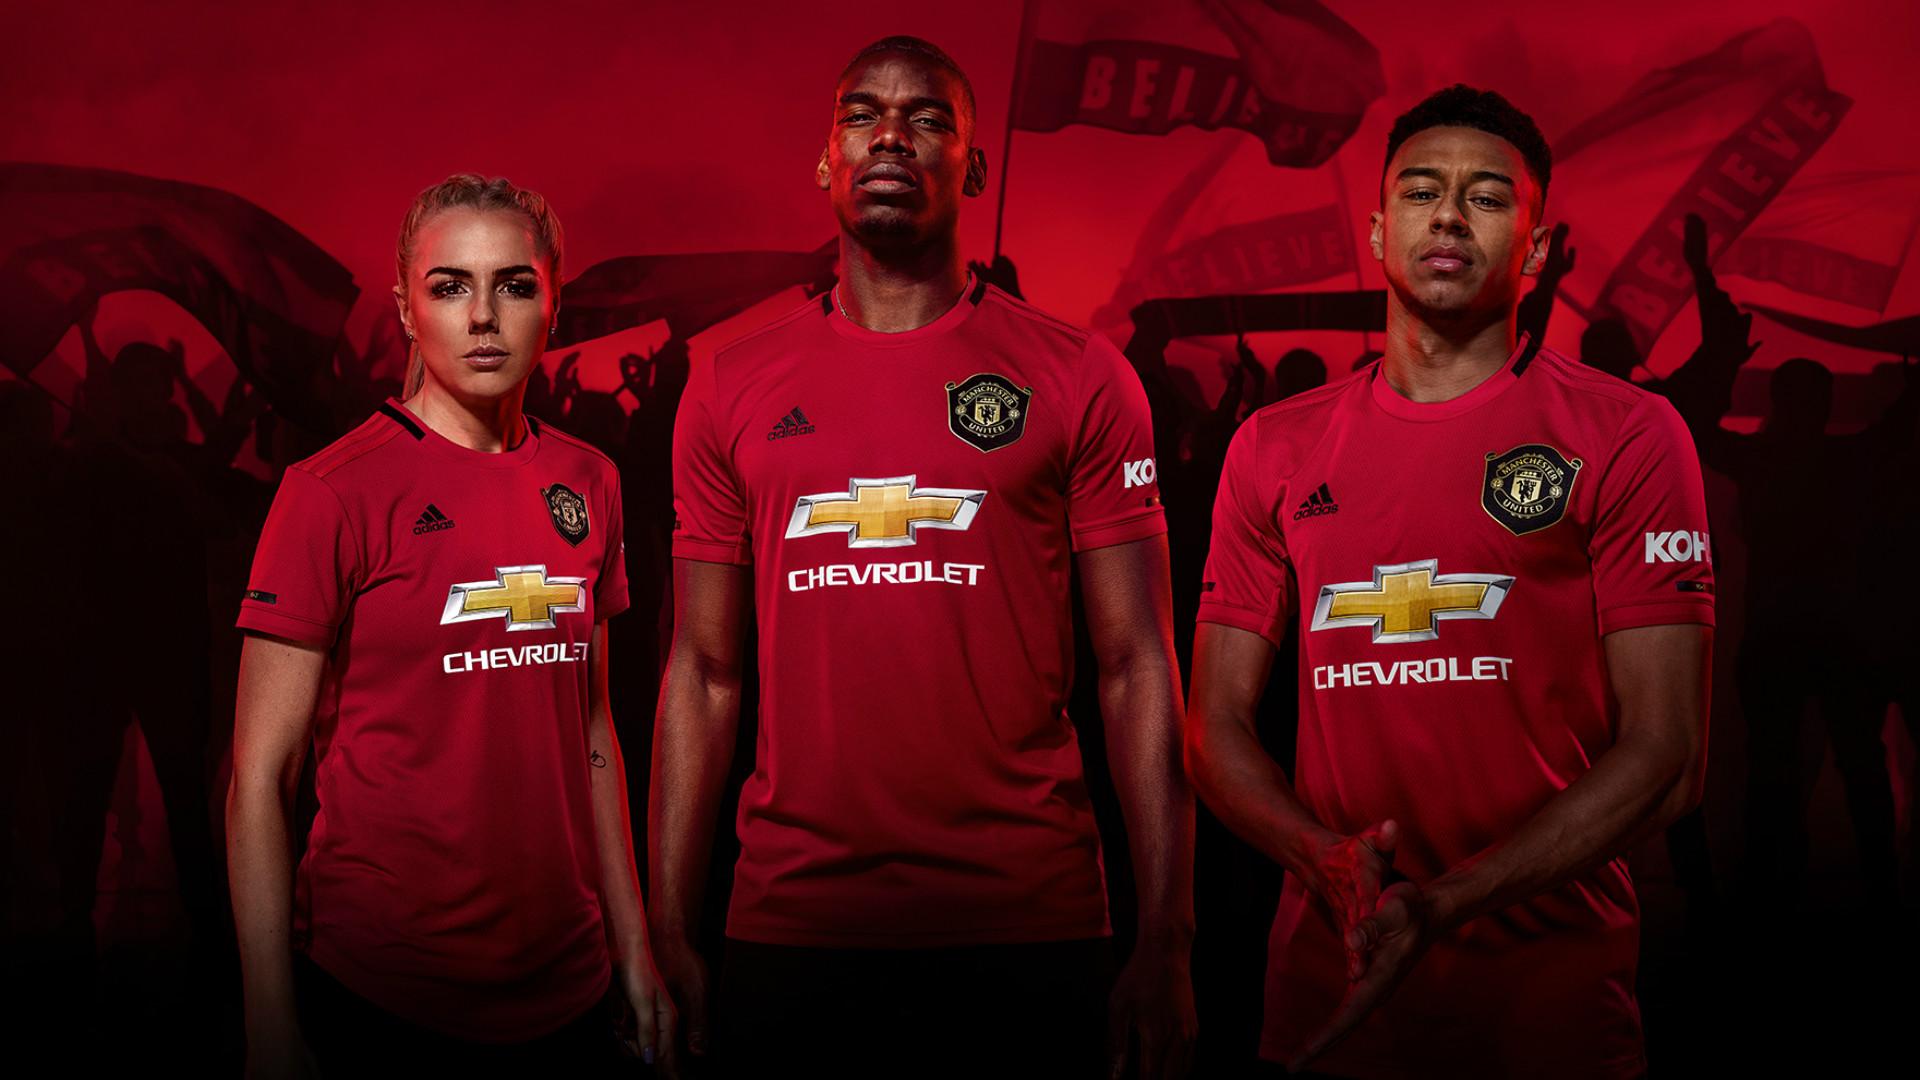 Manchester United Home Kit 2019-20